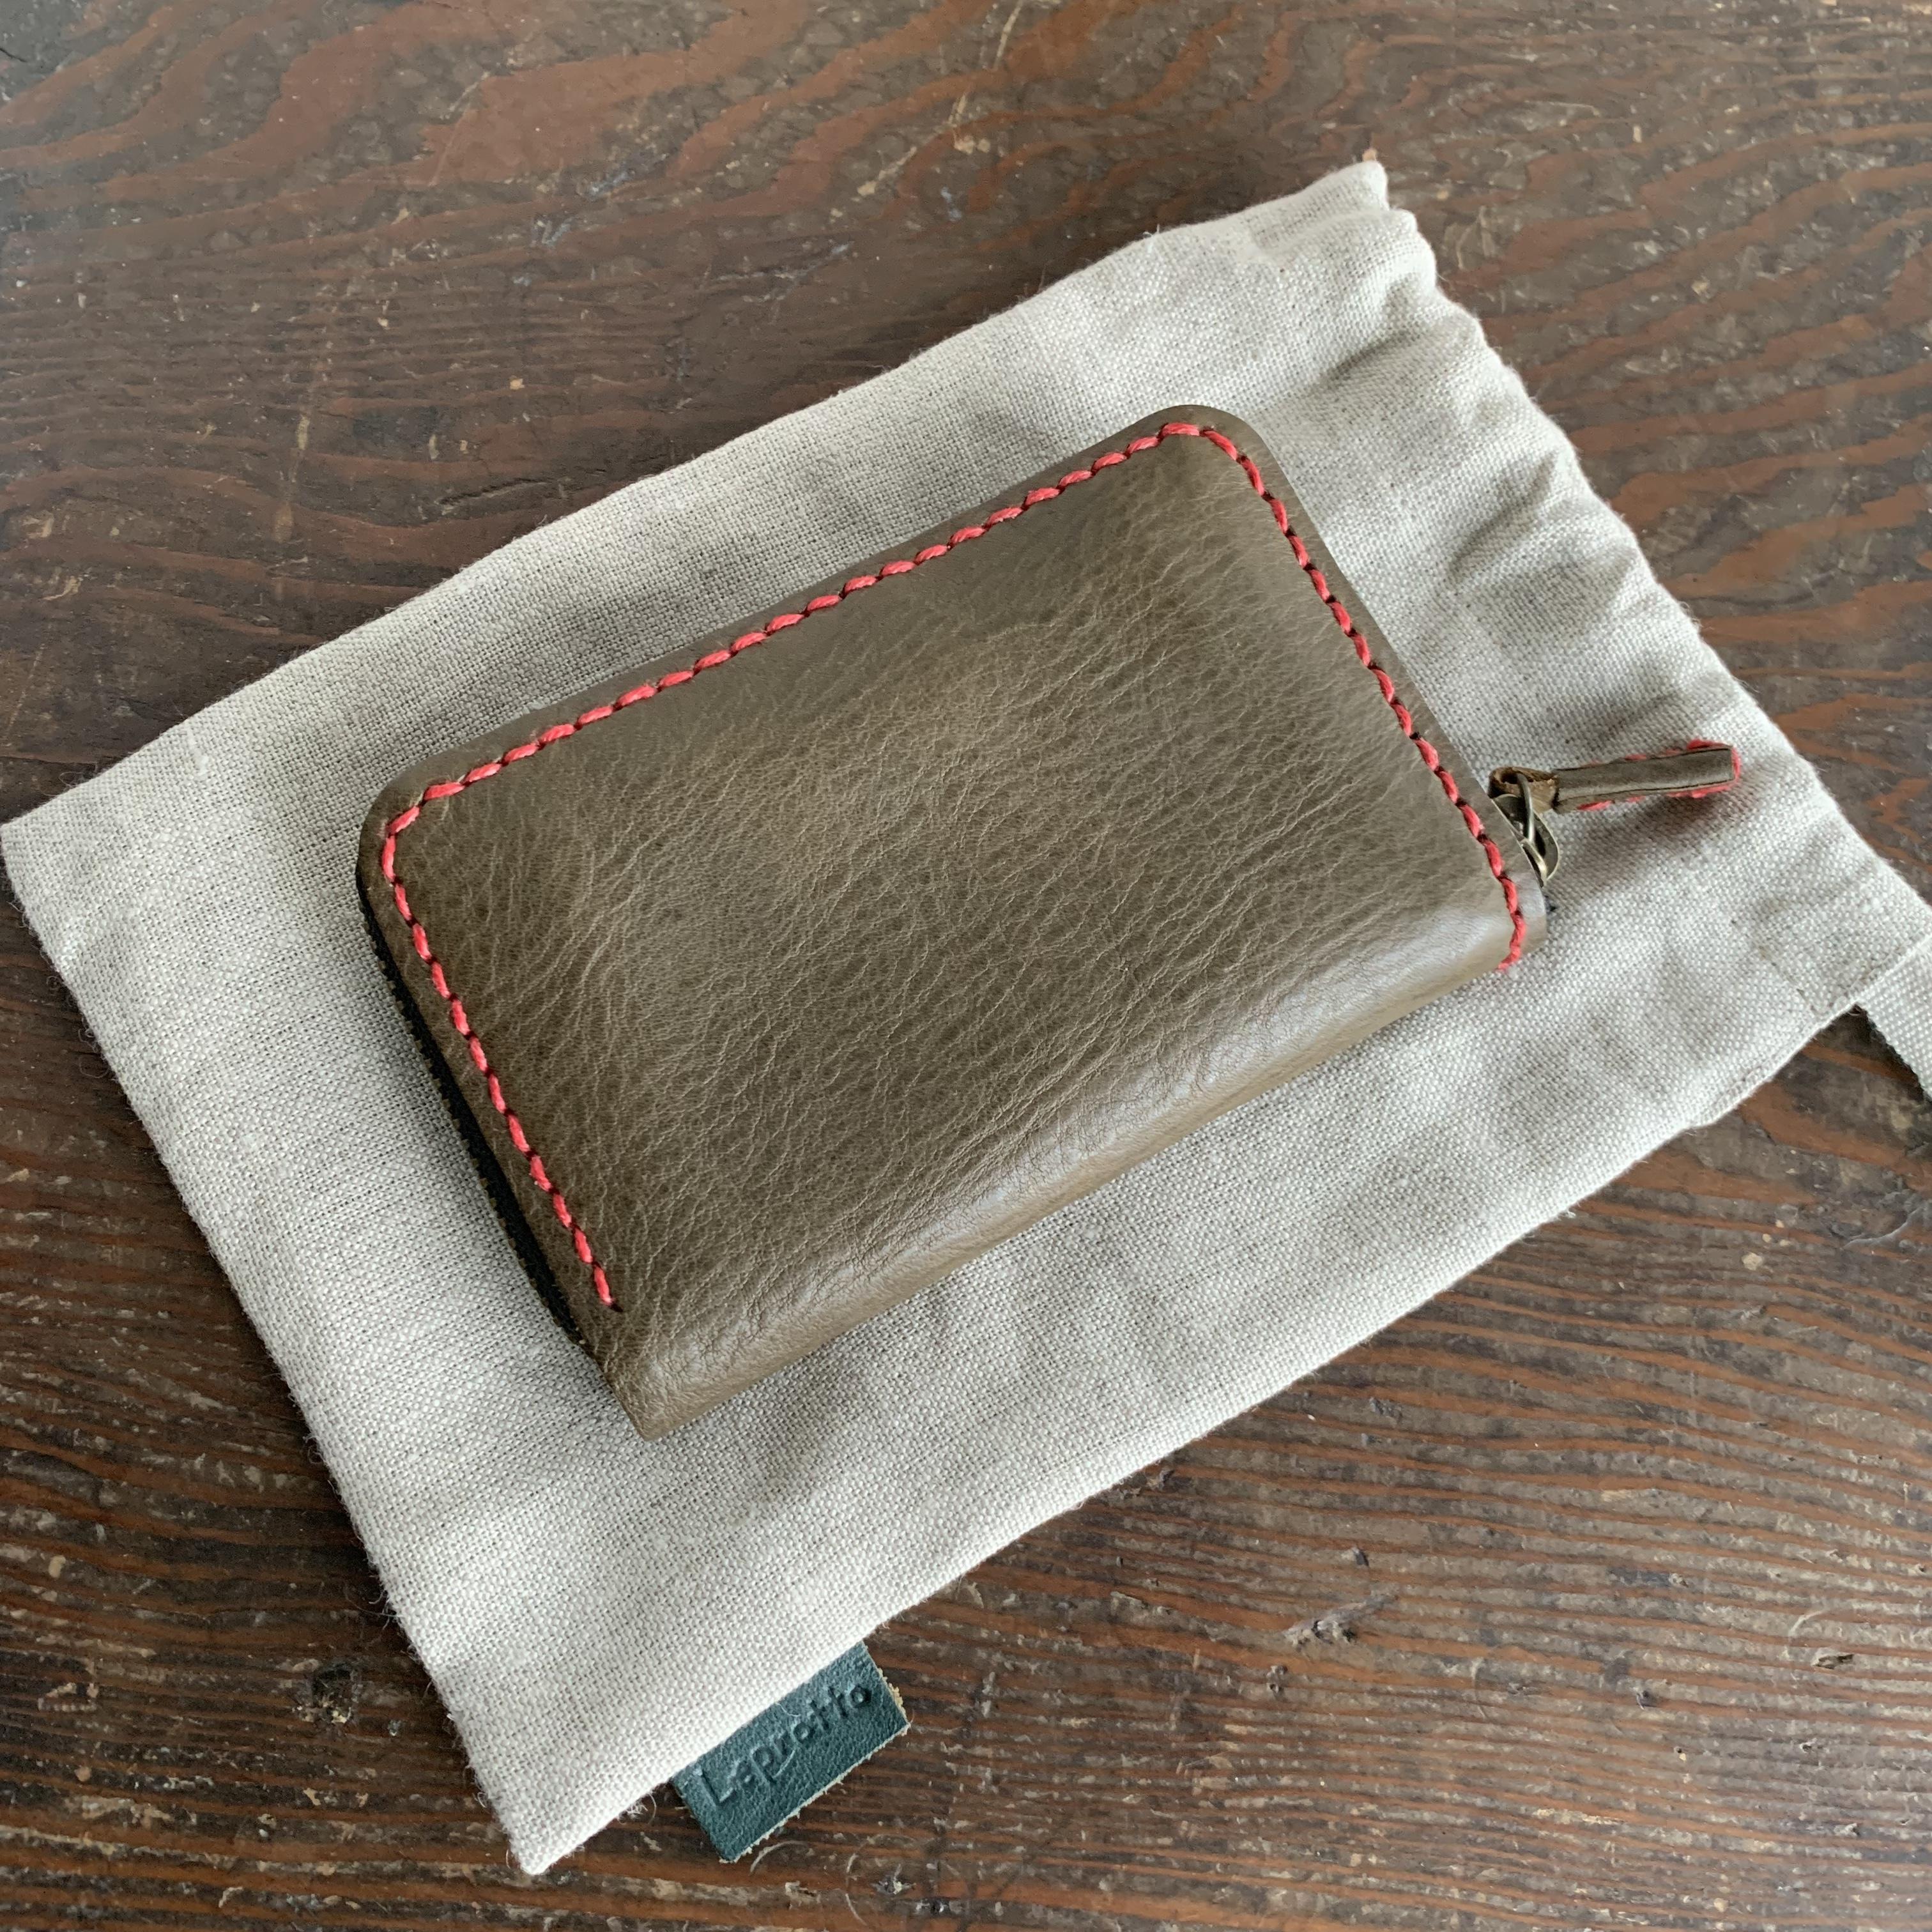 Leprotto 手縫いミニ財布